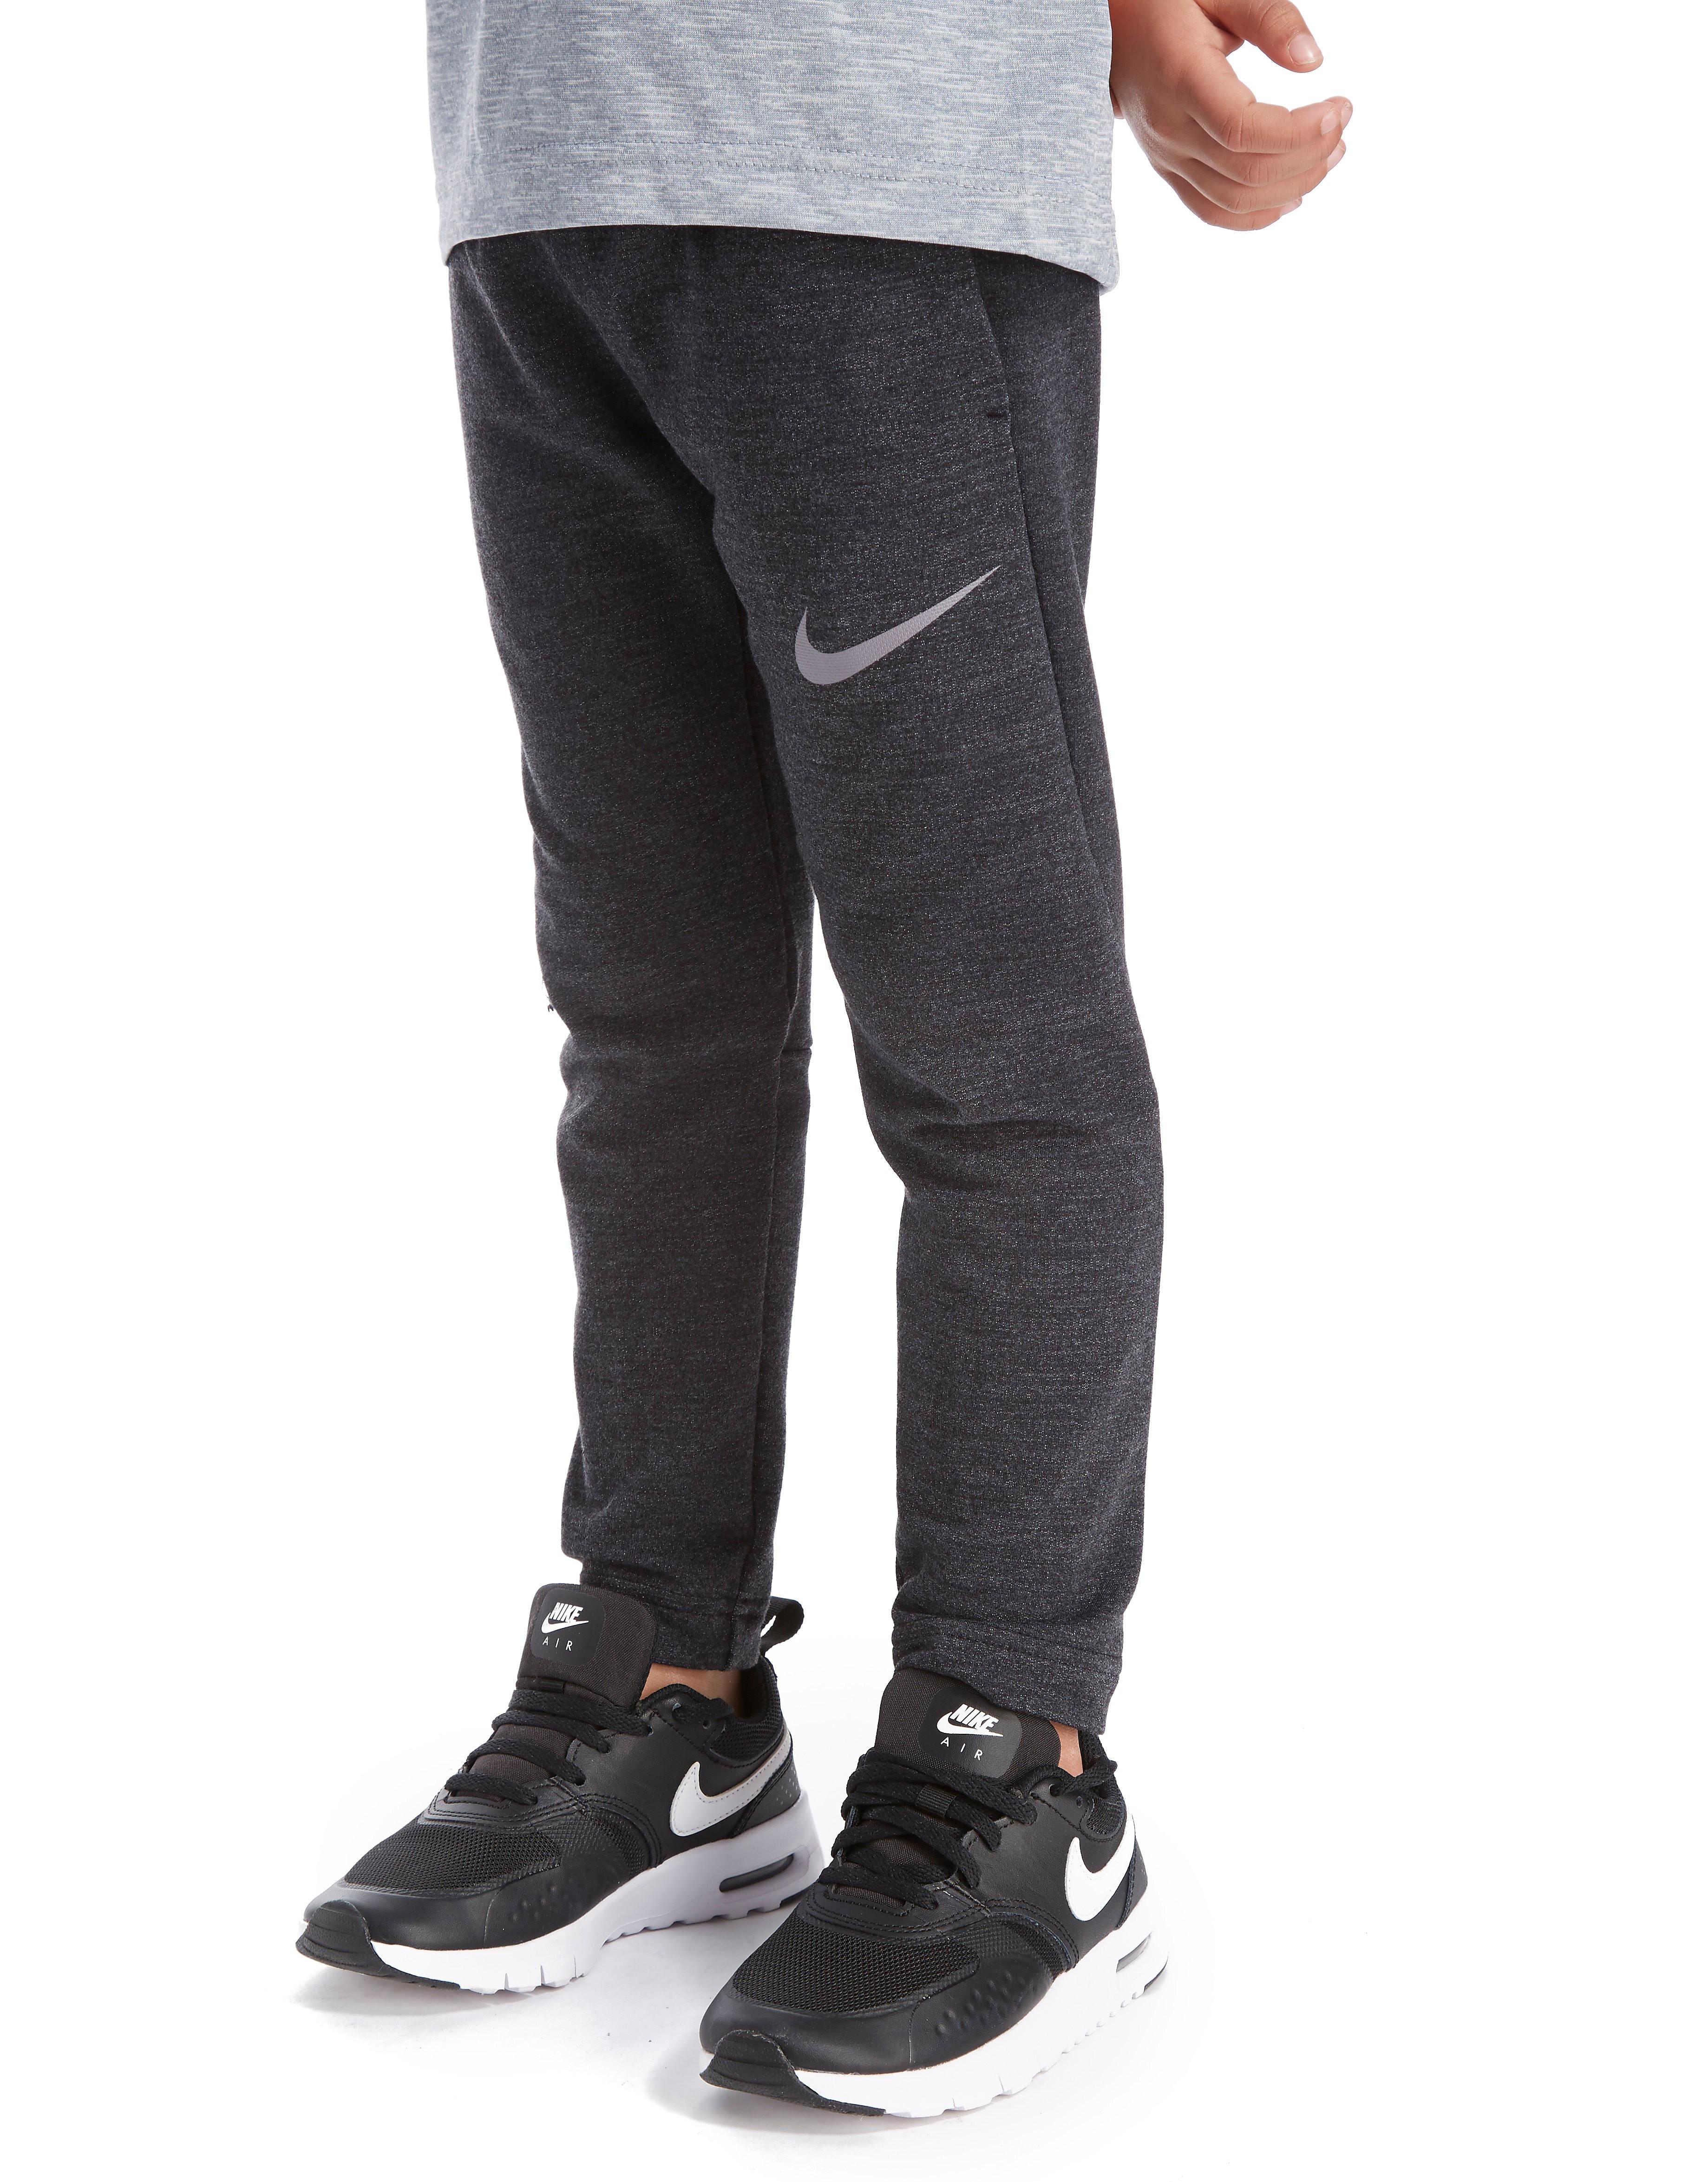 Nike Dri-FIT Pants Children